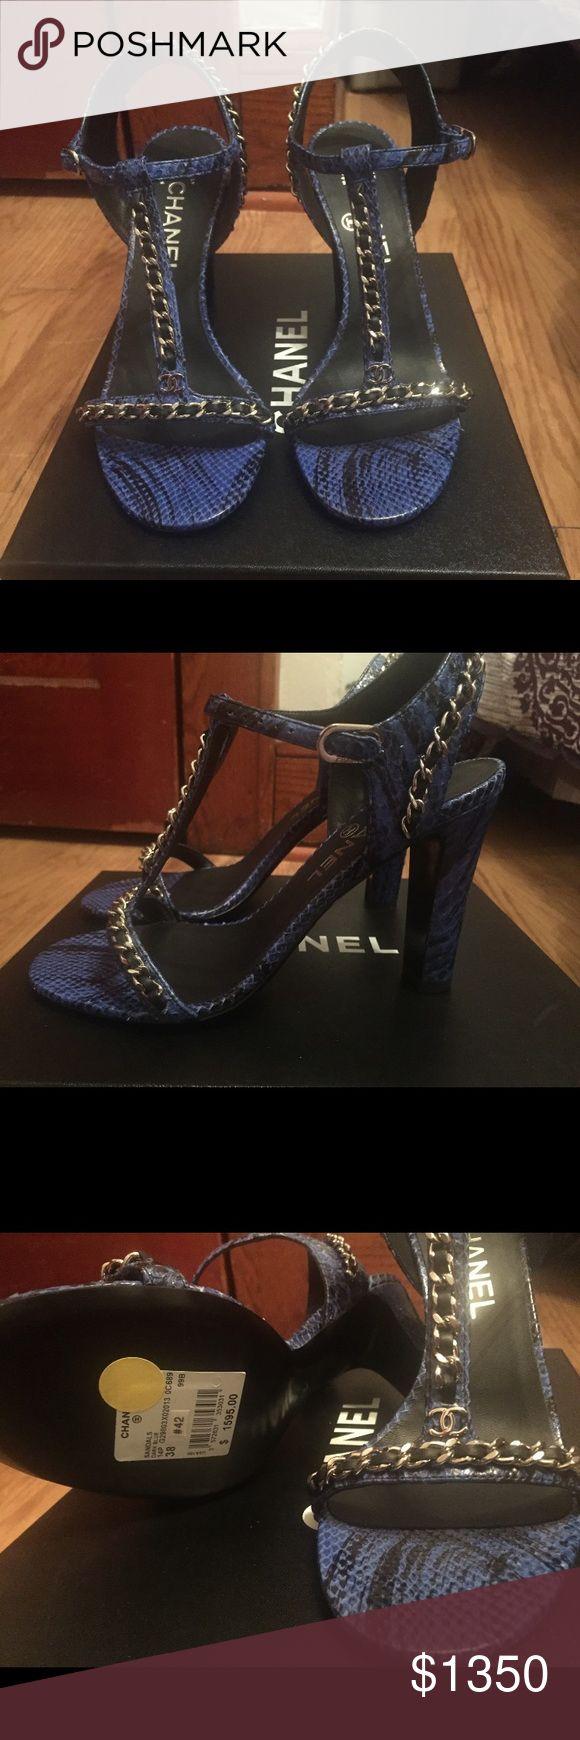 Chanel Blue python silver chain pumps Blue python silver chain pumps - CHANEL size 38 (b width)  Never worn Original price $1595 CHANEL Shoes Heels